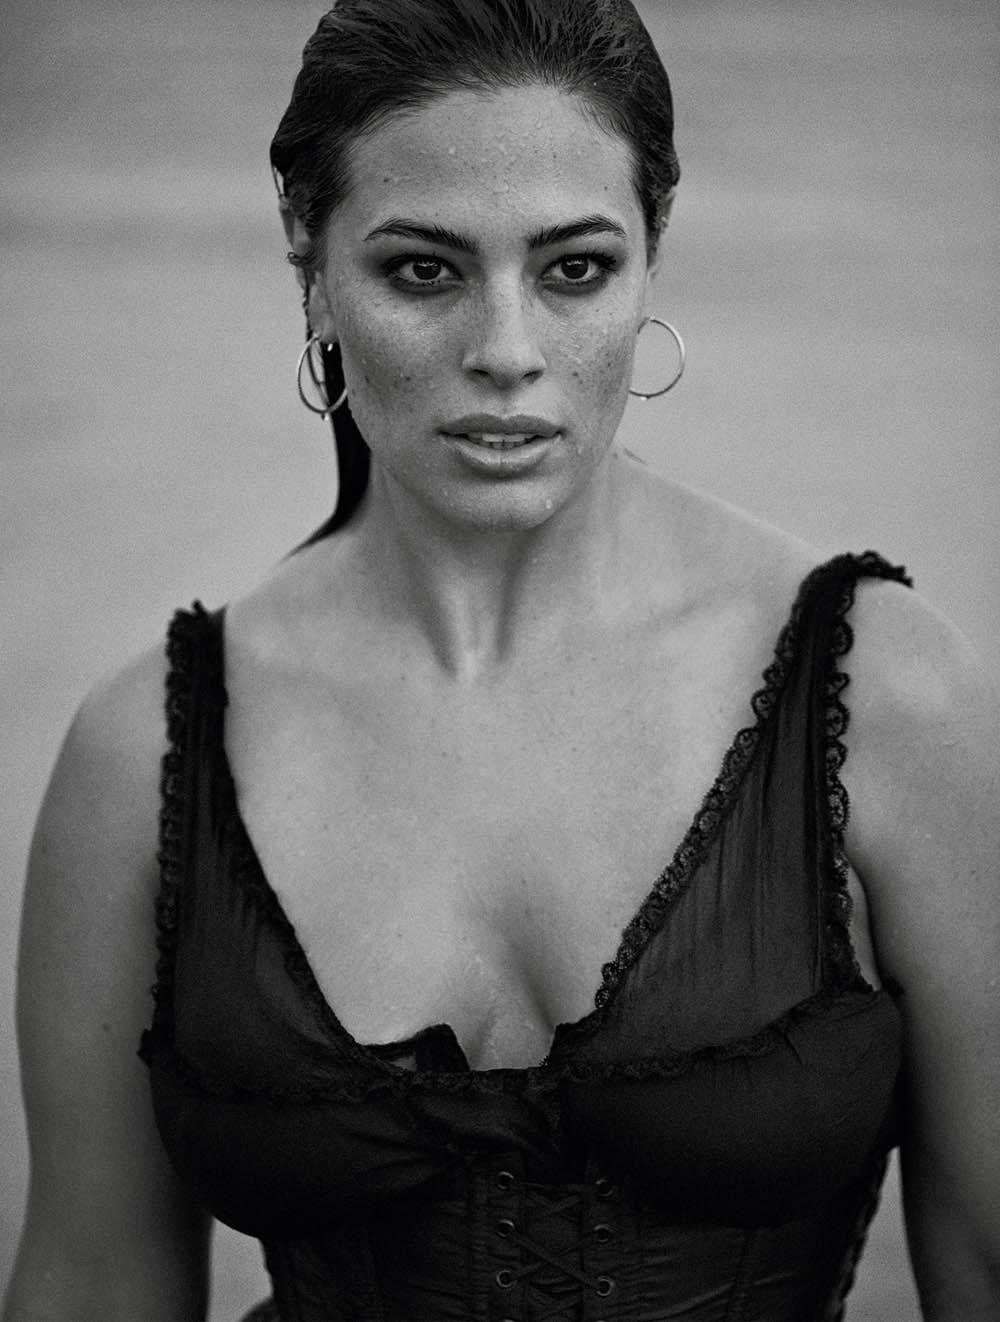 Ashley-Graham-by-Lachlan-Bailey-for-Vogue-Paris-November-2018-5.jpg